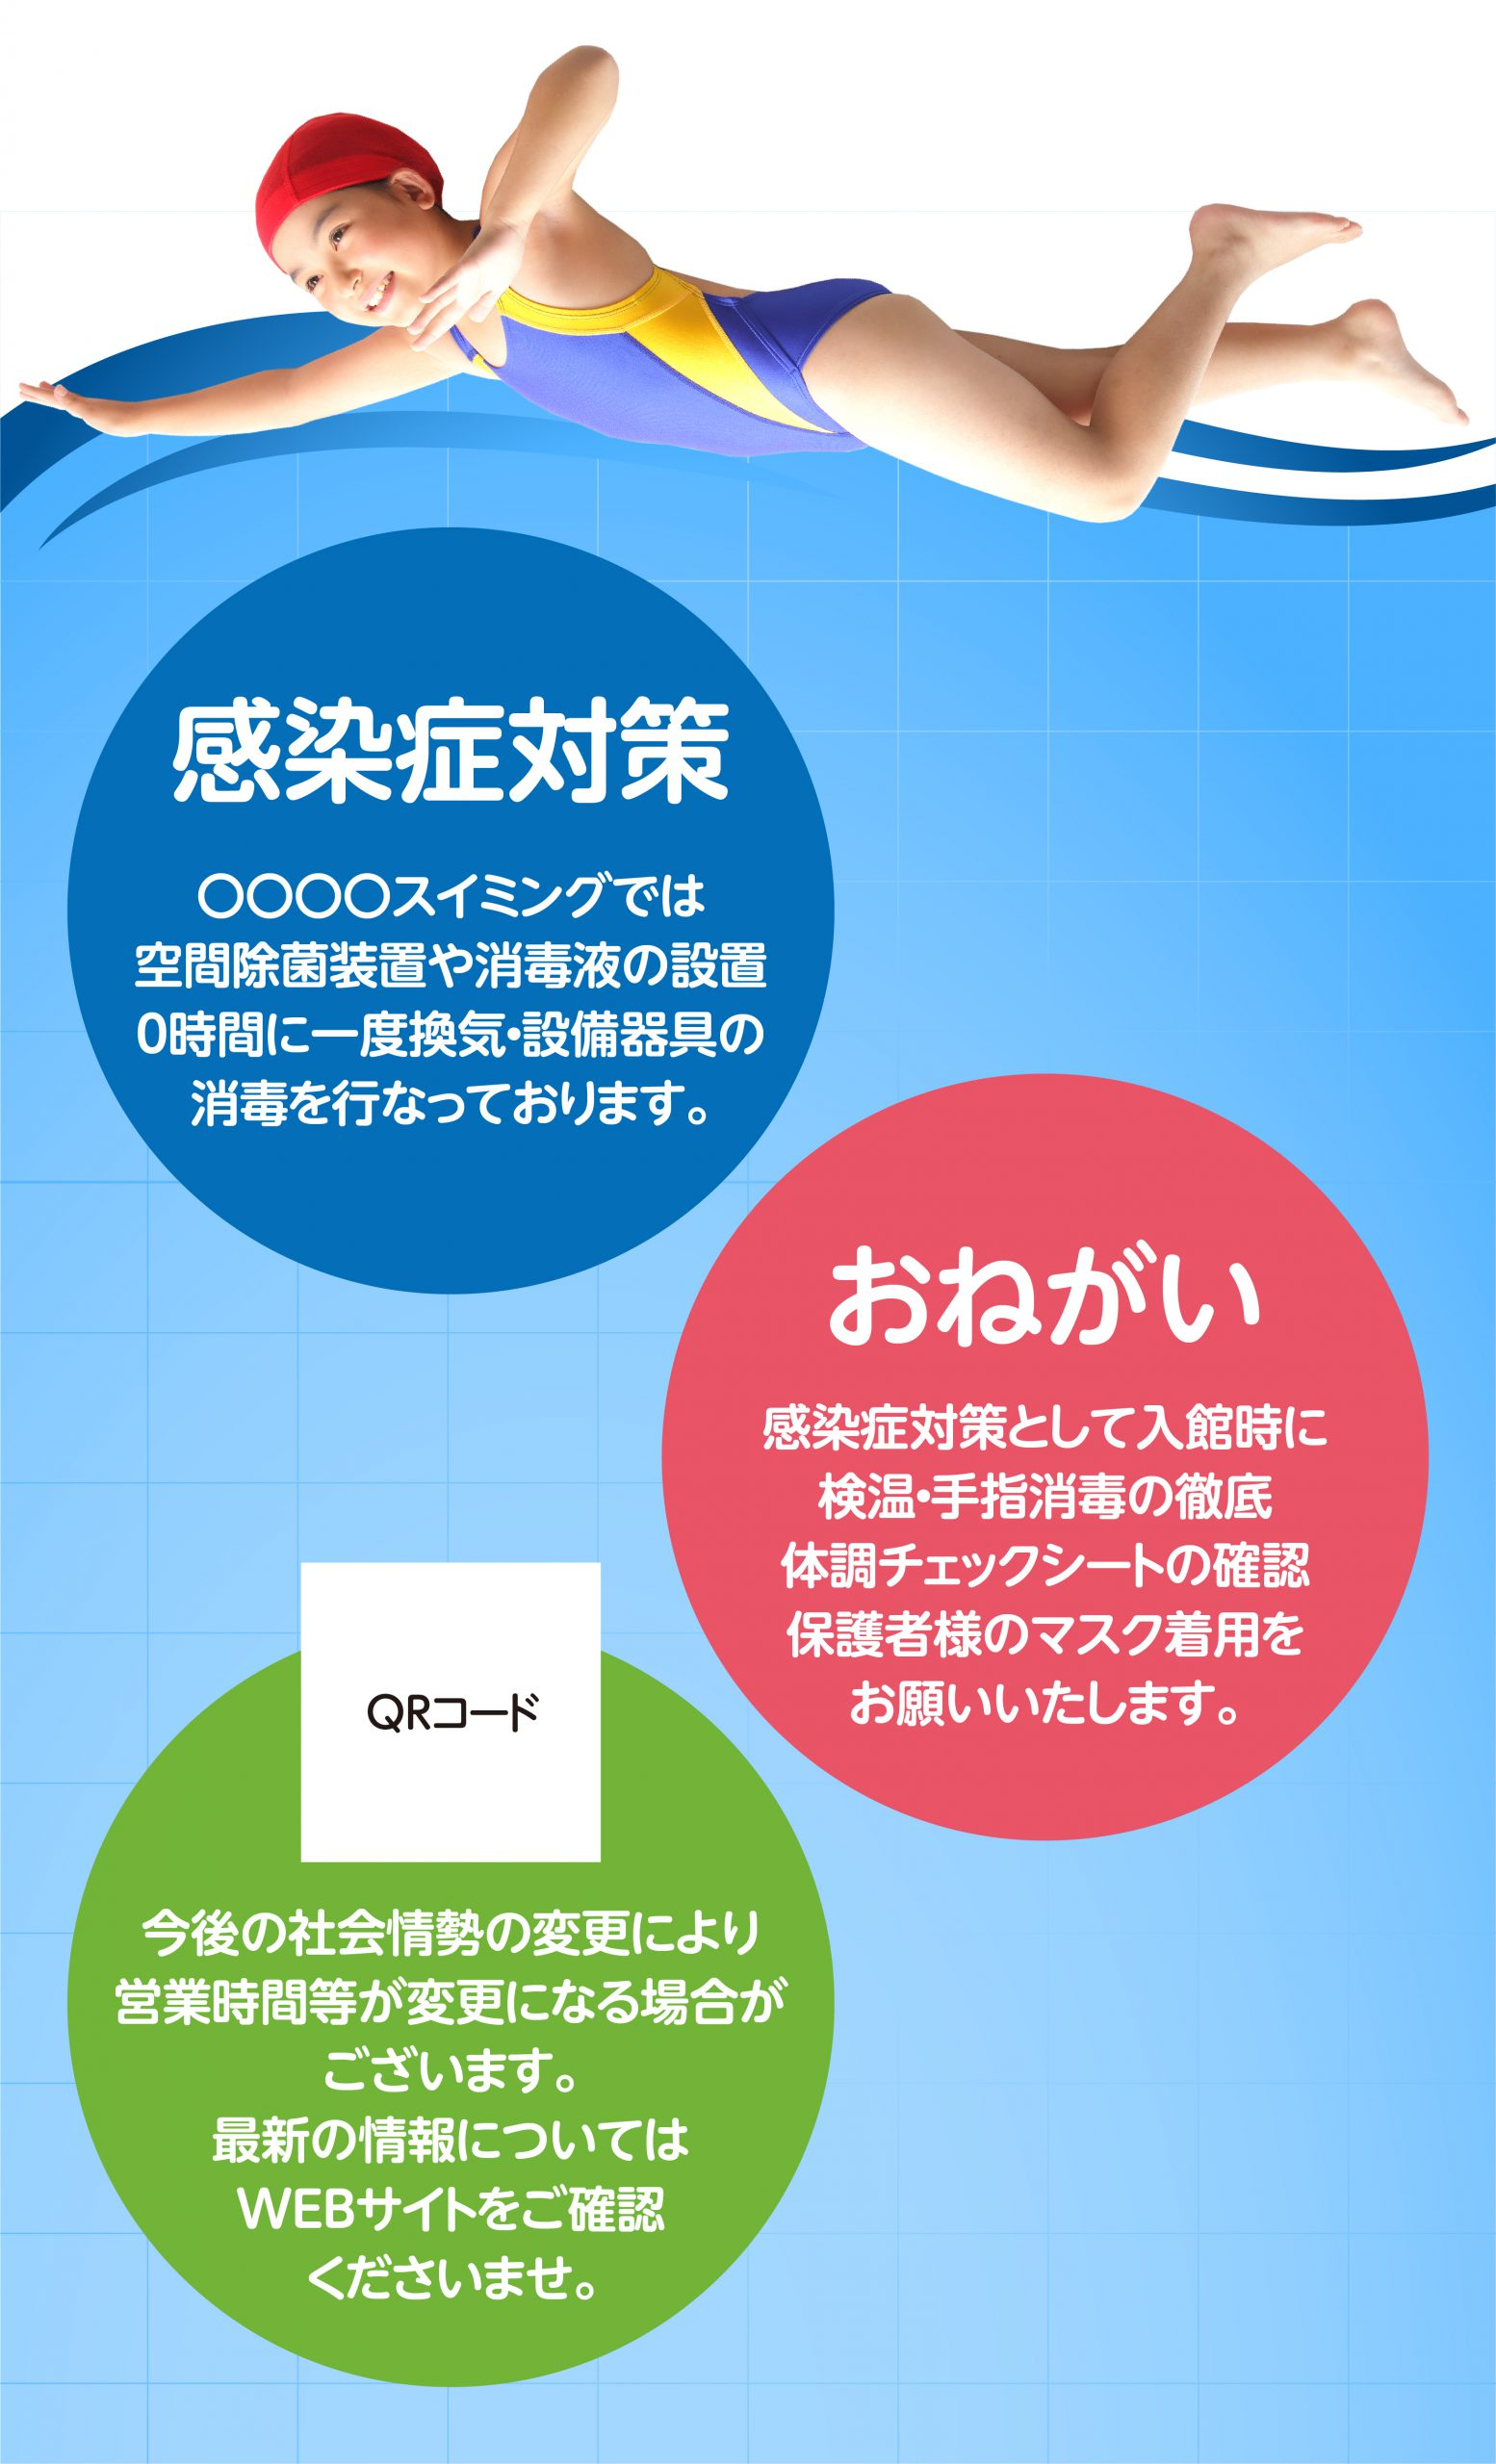 cv-case-ch-20n_d-coro_03-2